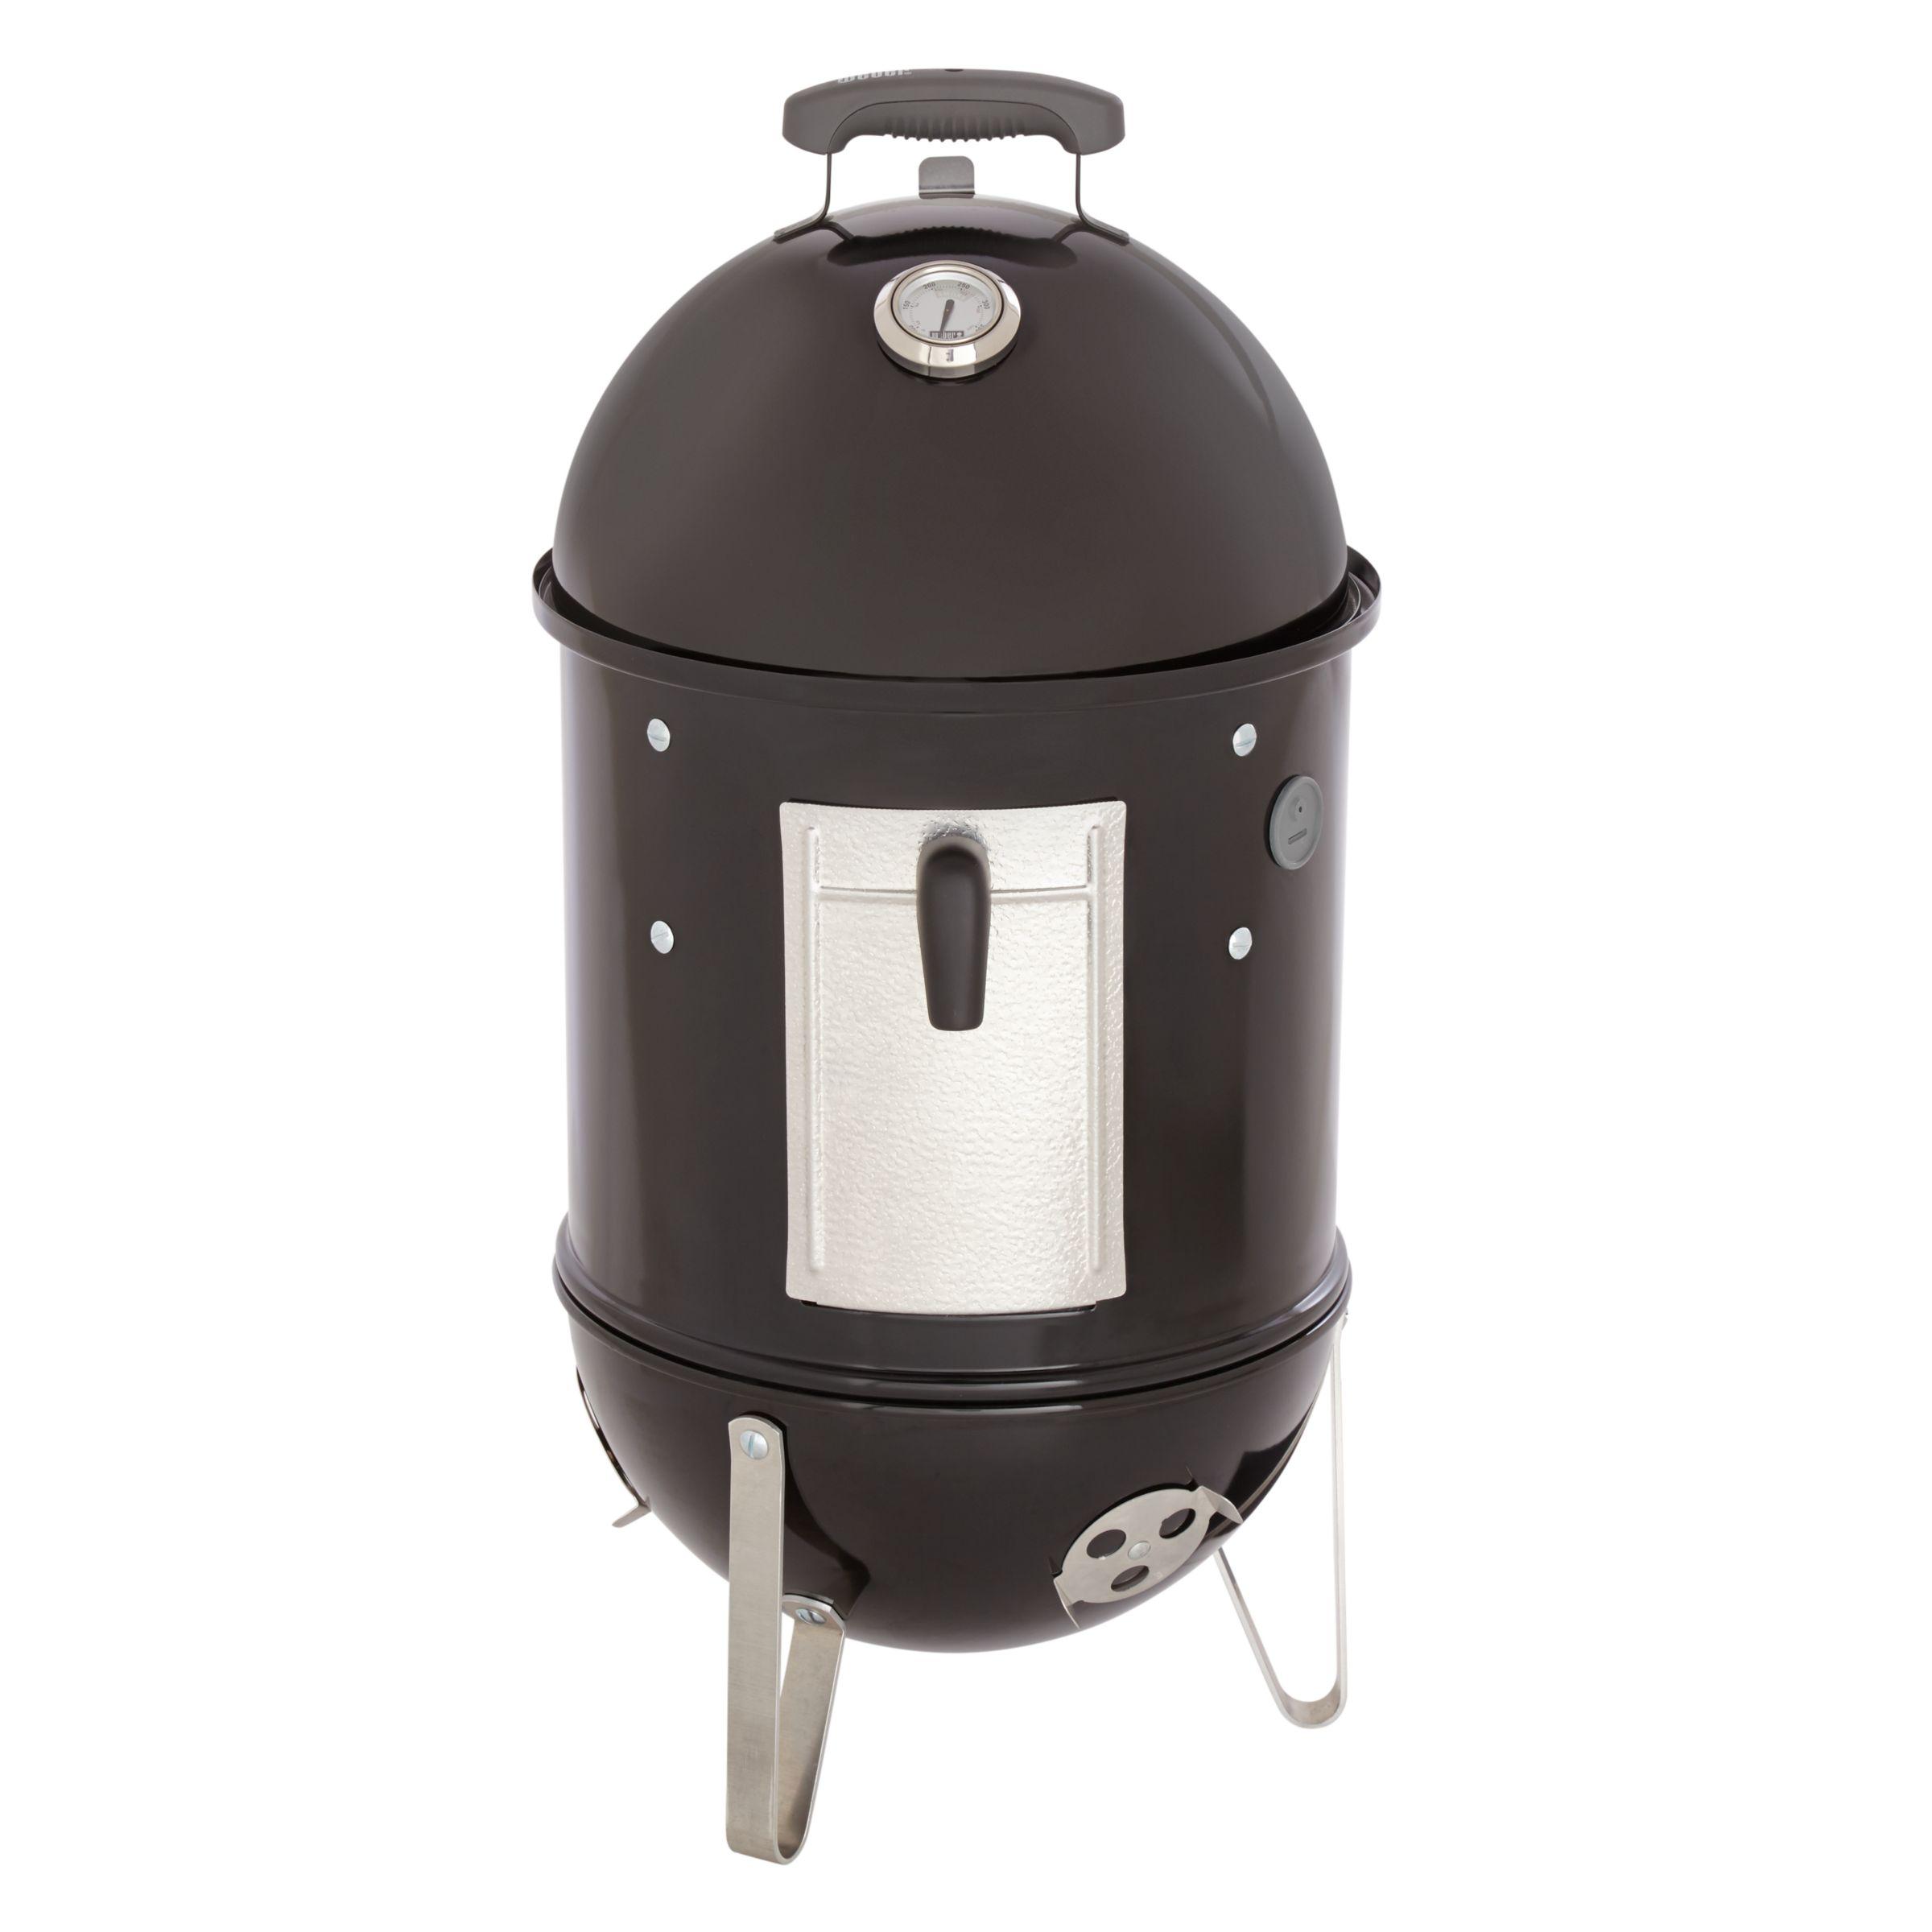 Weber Smokey Mountain Charcoal Barbecue, Black